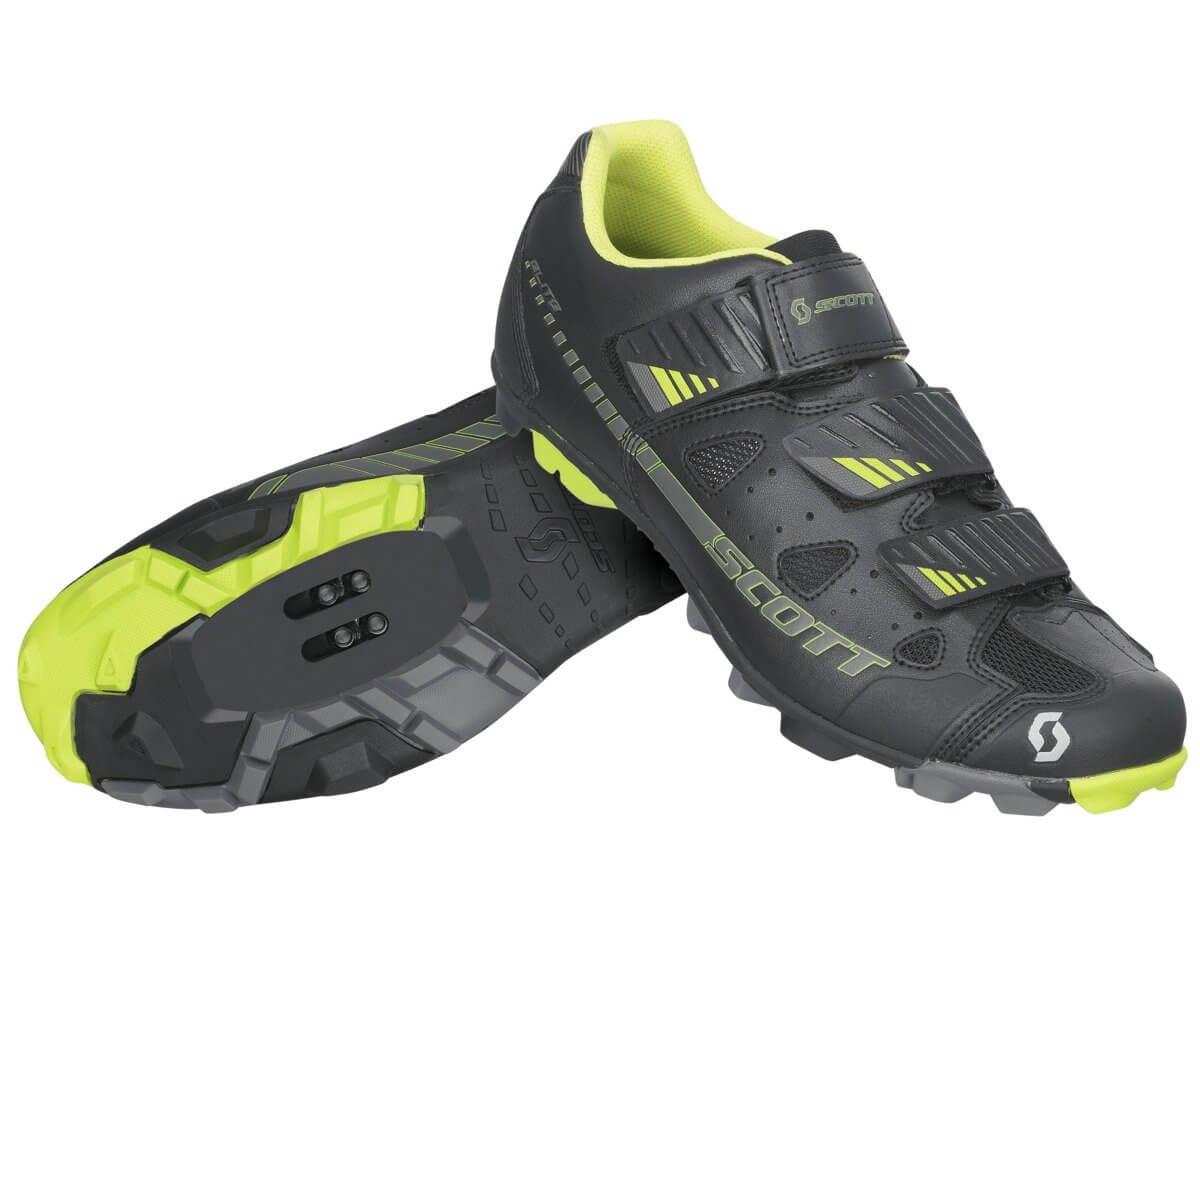 Scott Mtb Shoe Elite Black And Green